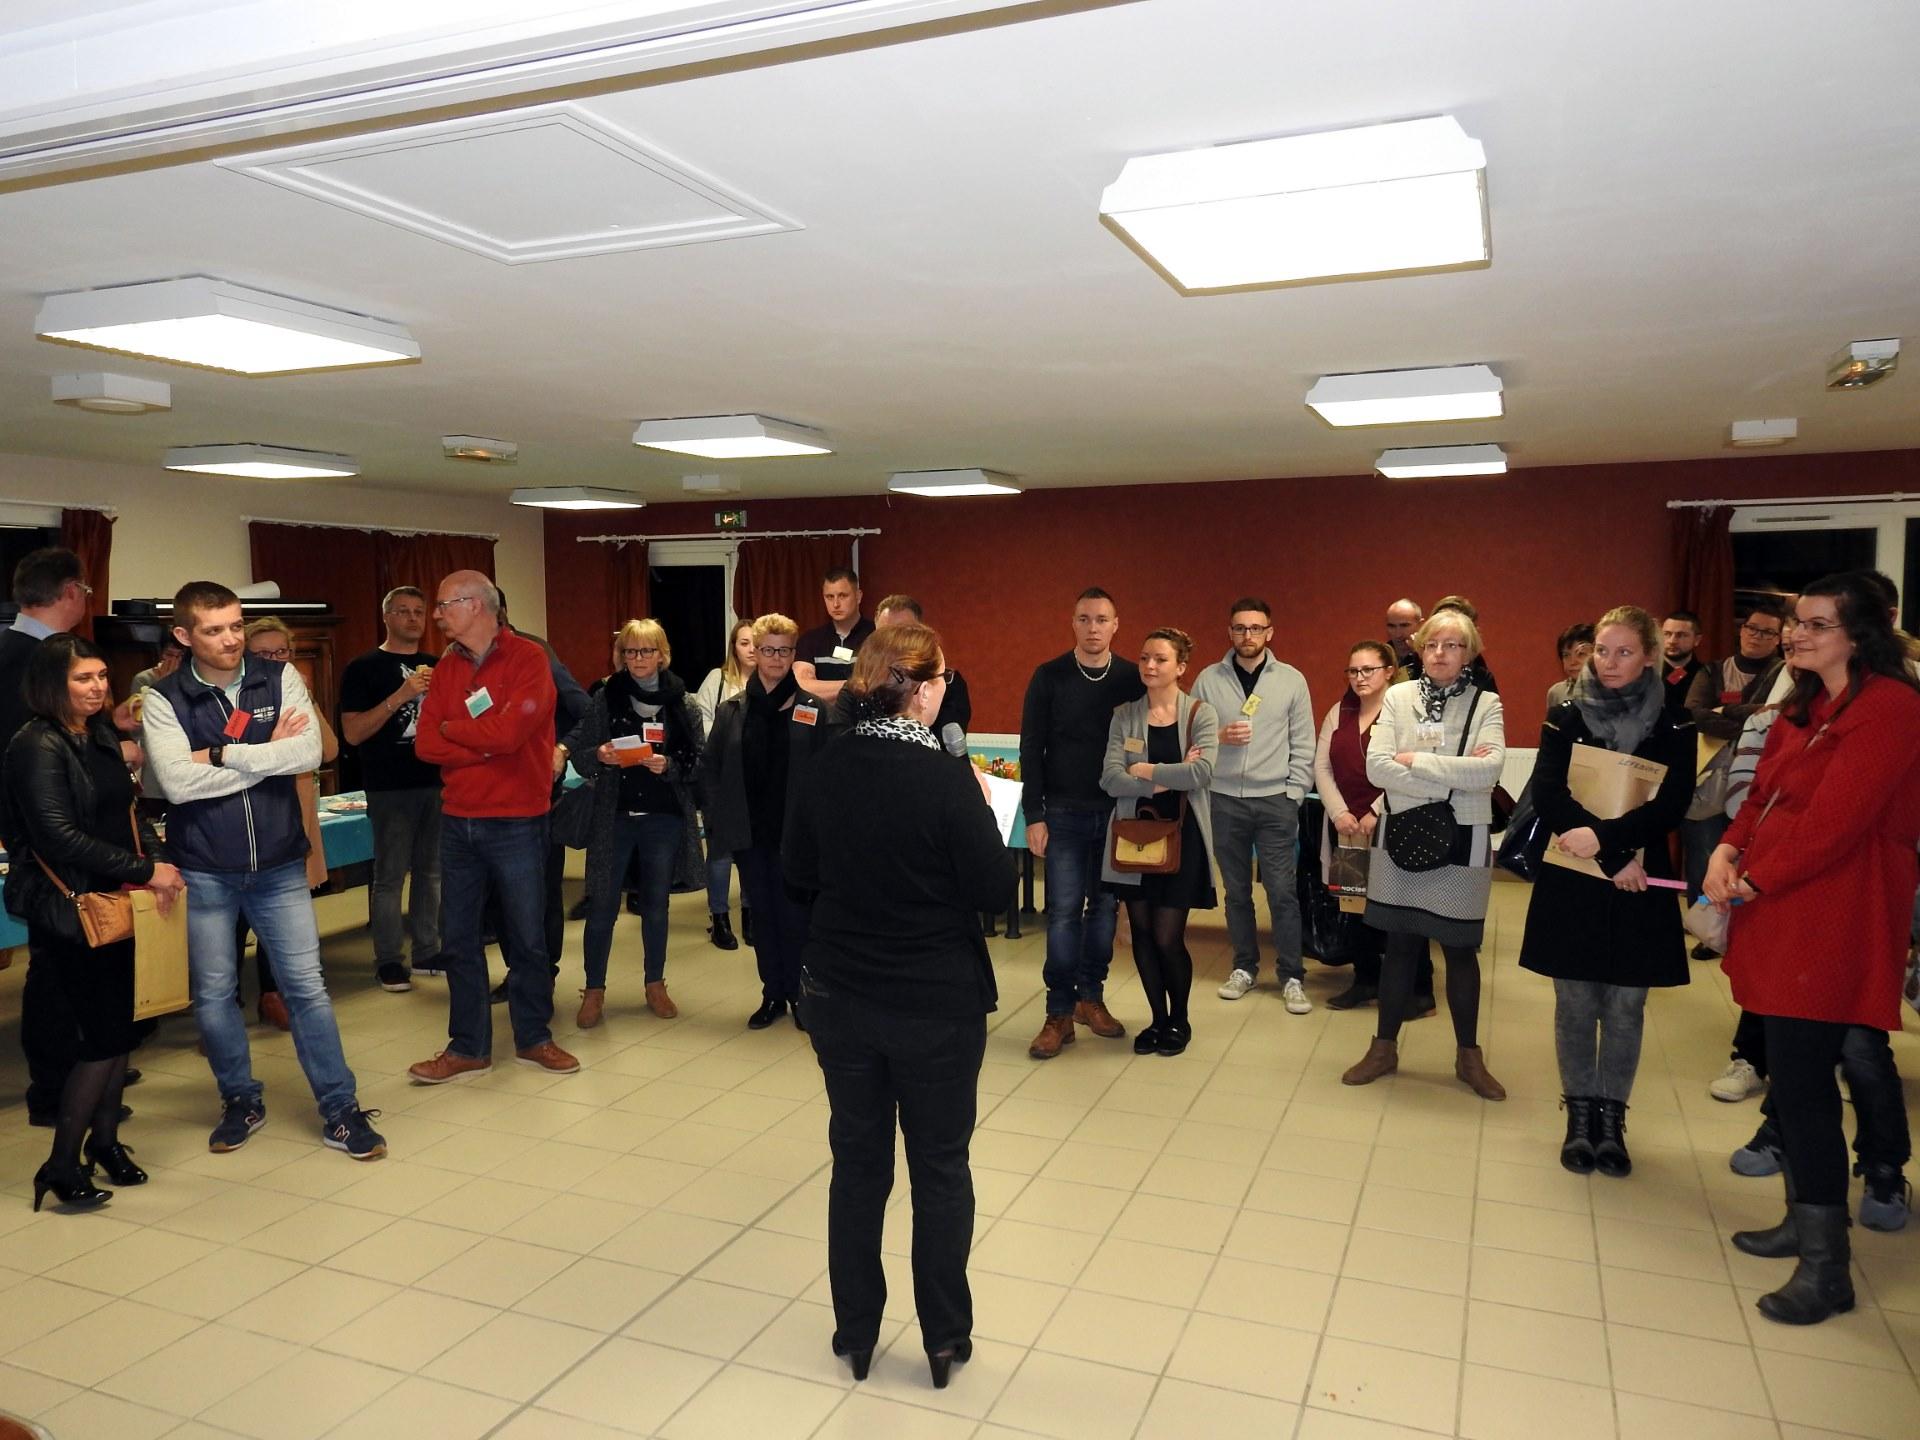 2018_03_16-11-Caudry (59)-Preparation au mariage